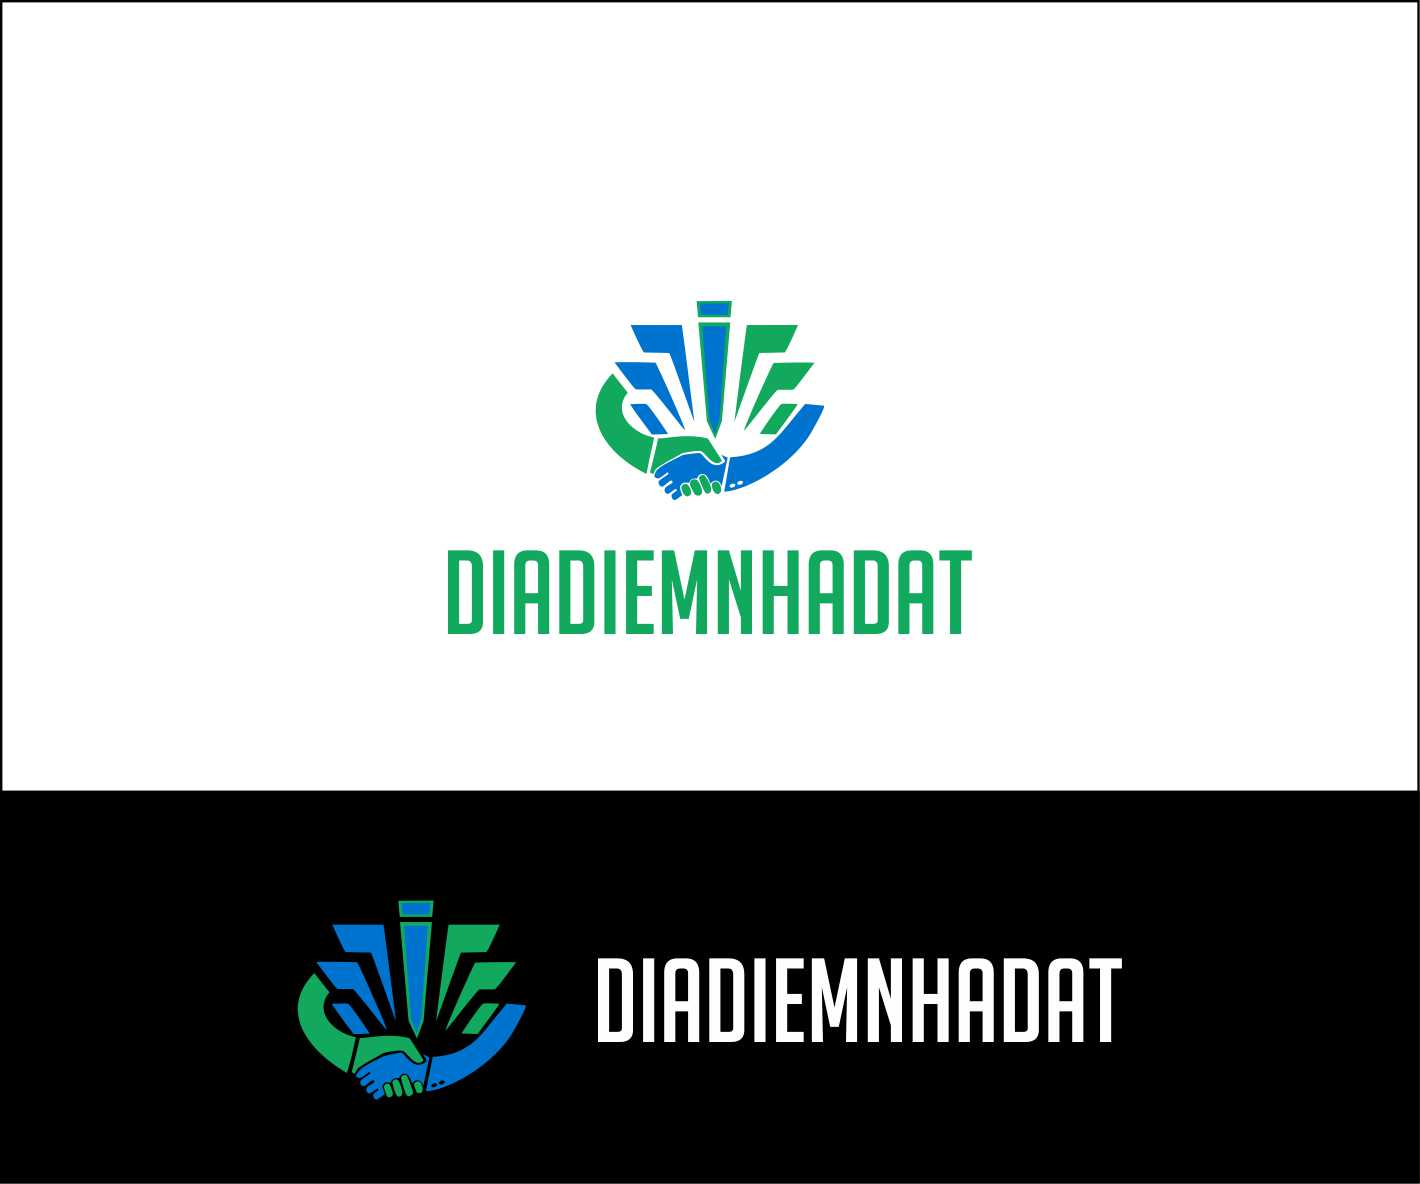 Logo Design by Private User - Entry No. 59 in the Logo Design Contest New Logo Design for DIADIEMNHADAT.